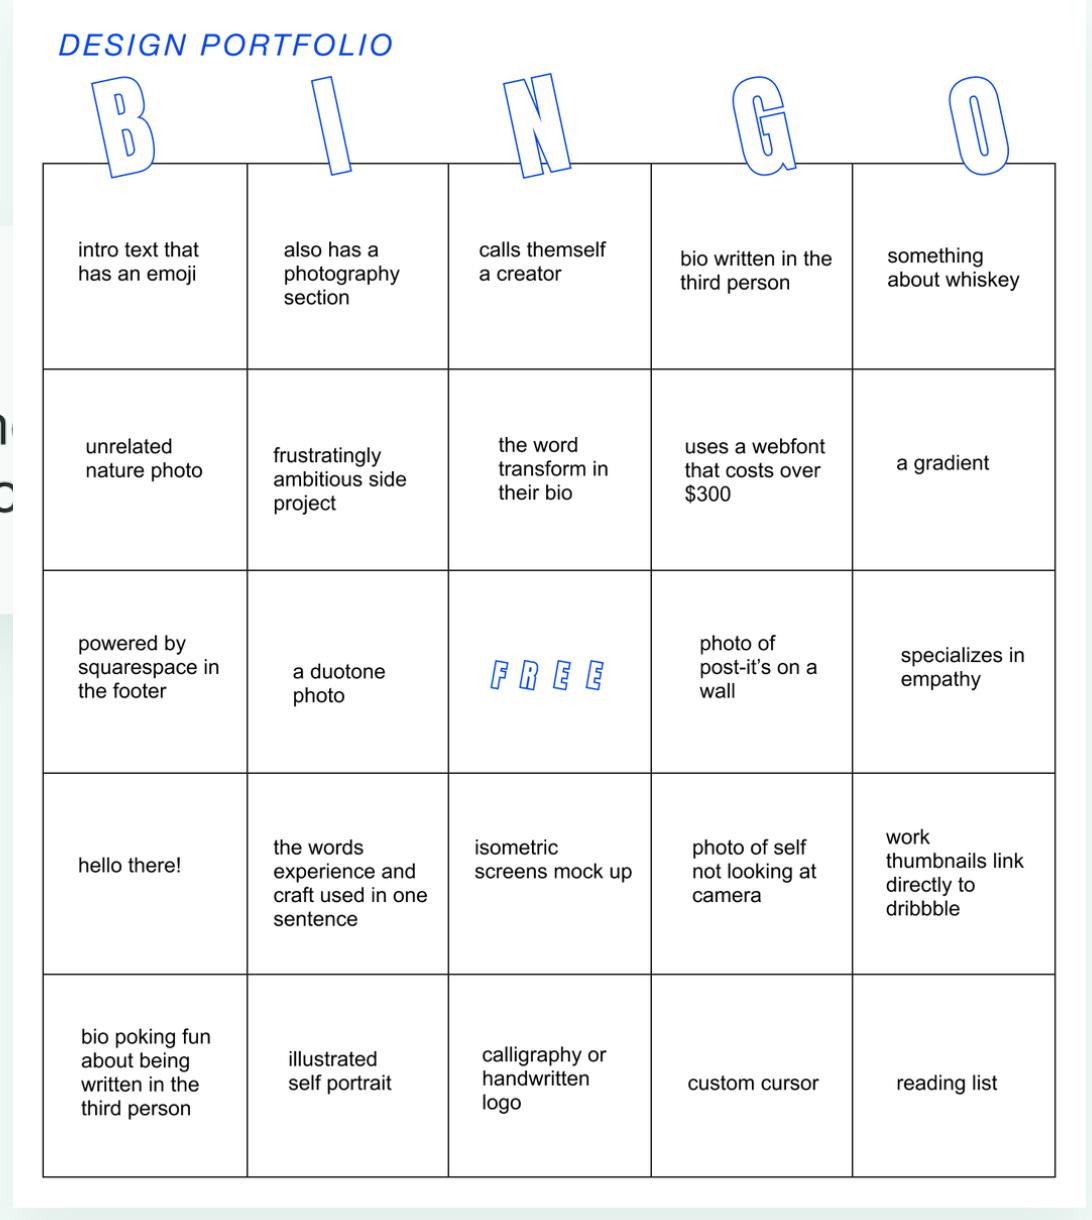 Design portfolio Bingo card